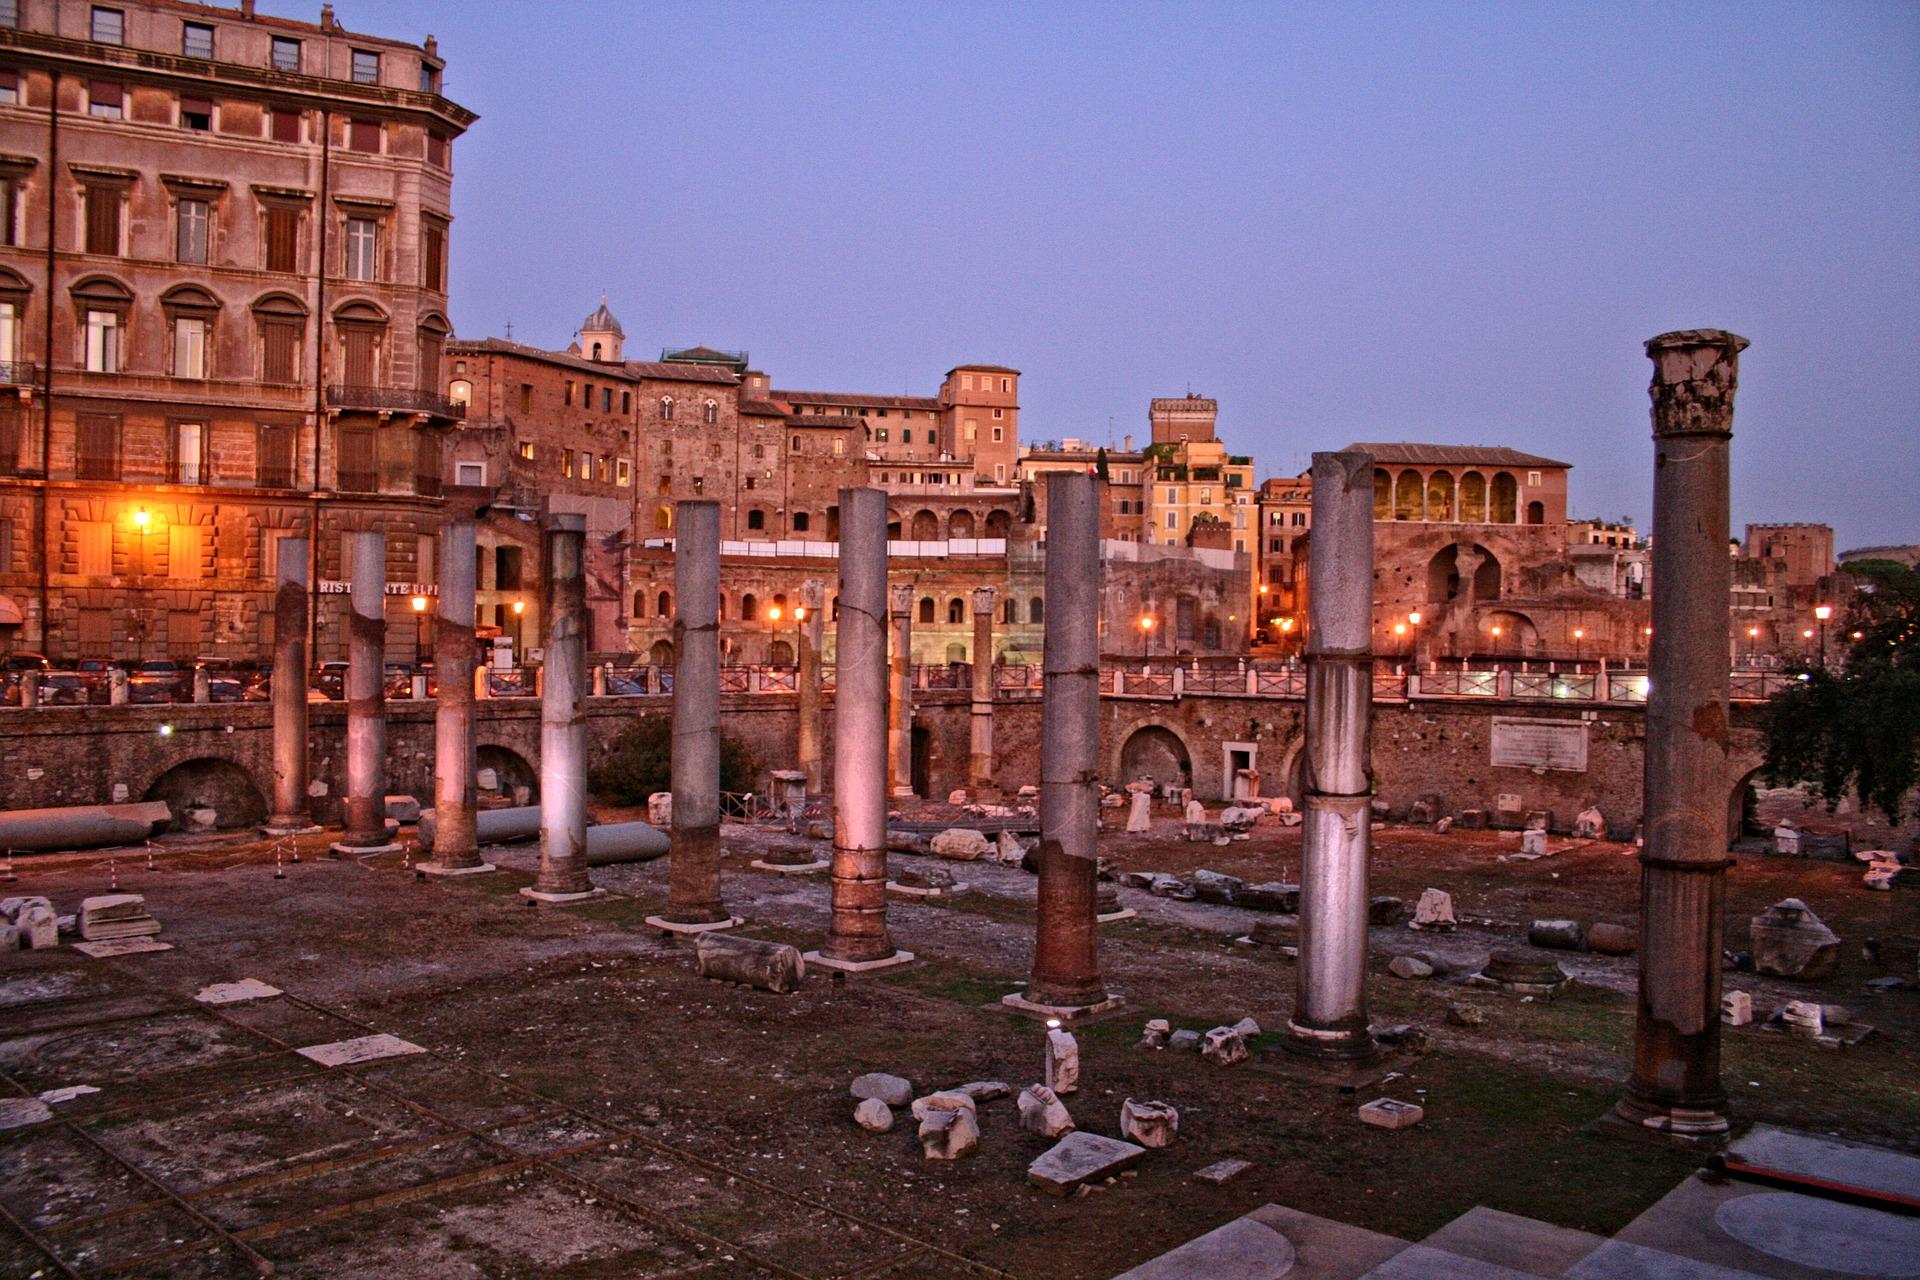 Roman Forum, Rome - at night